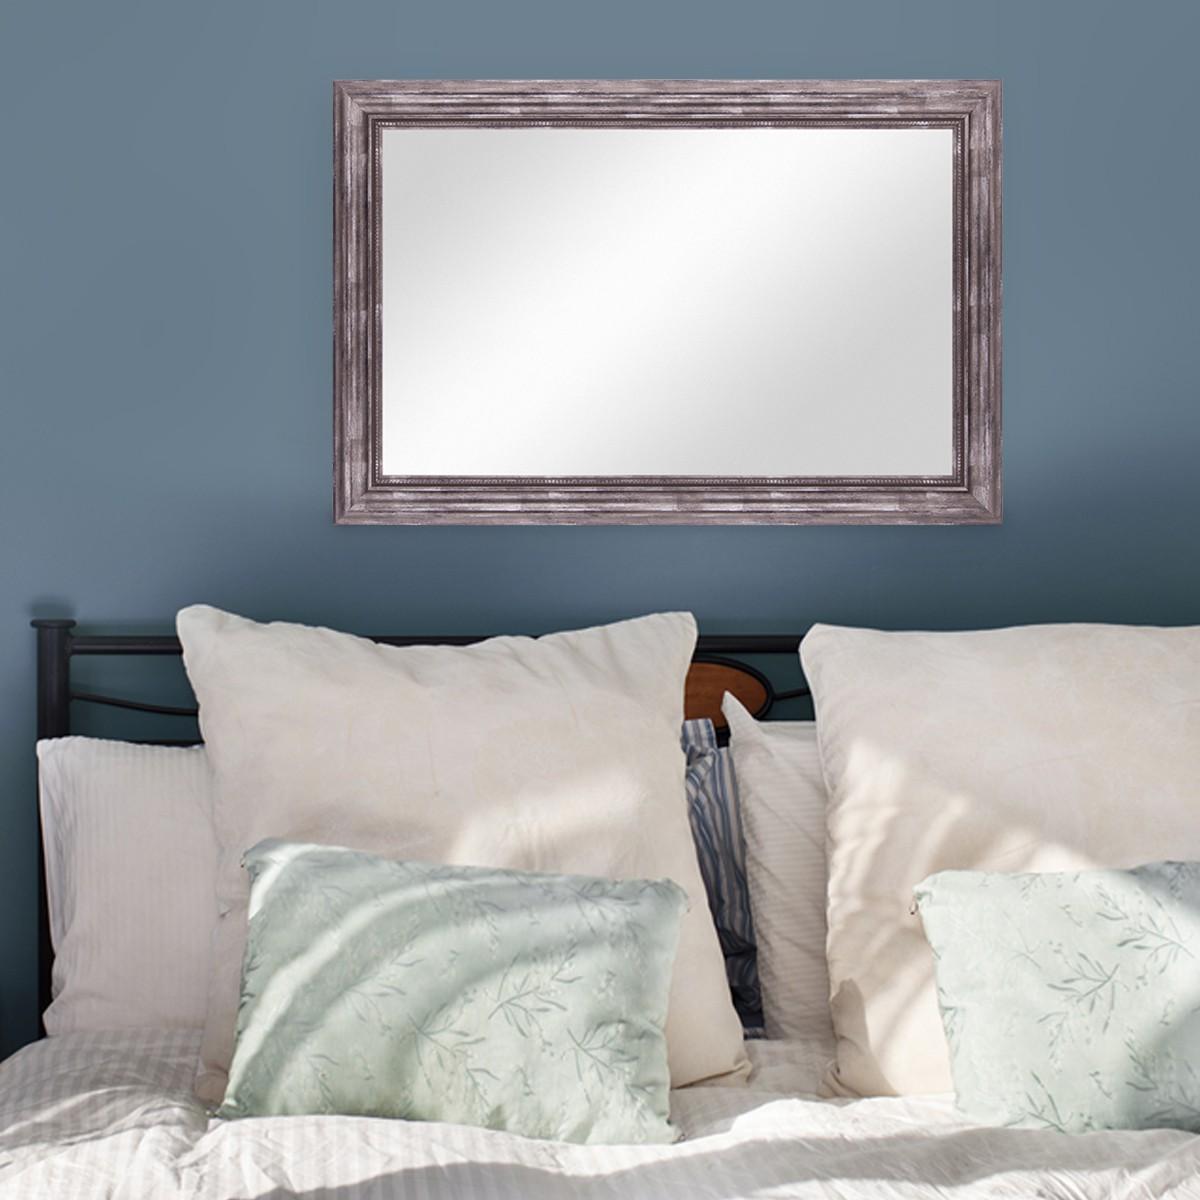 Relativ Wand-Spiegel 60x70 cm im Massivholz-Rahmen Barock-Stil Antik  VE81